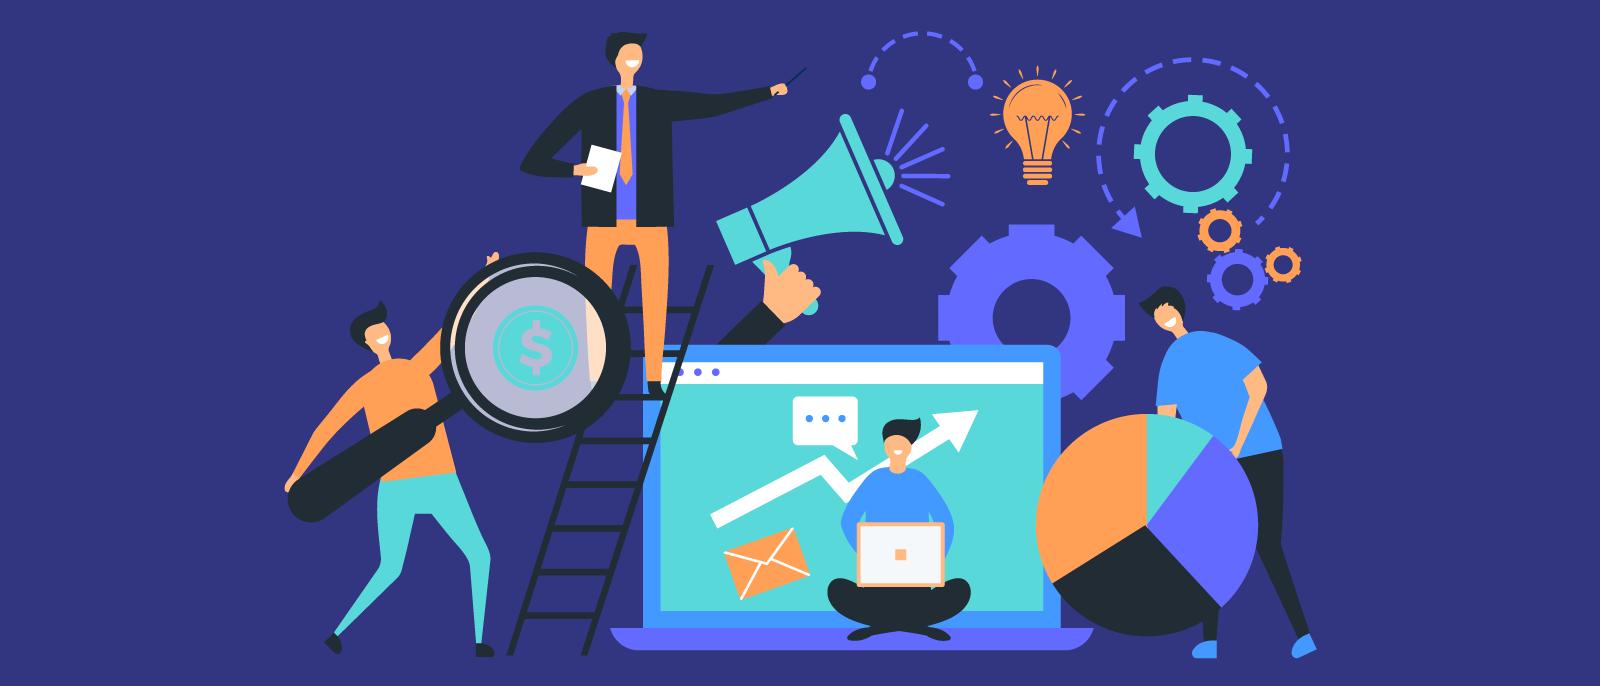 sales team collaboration